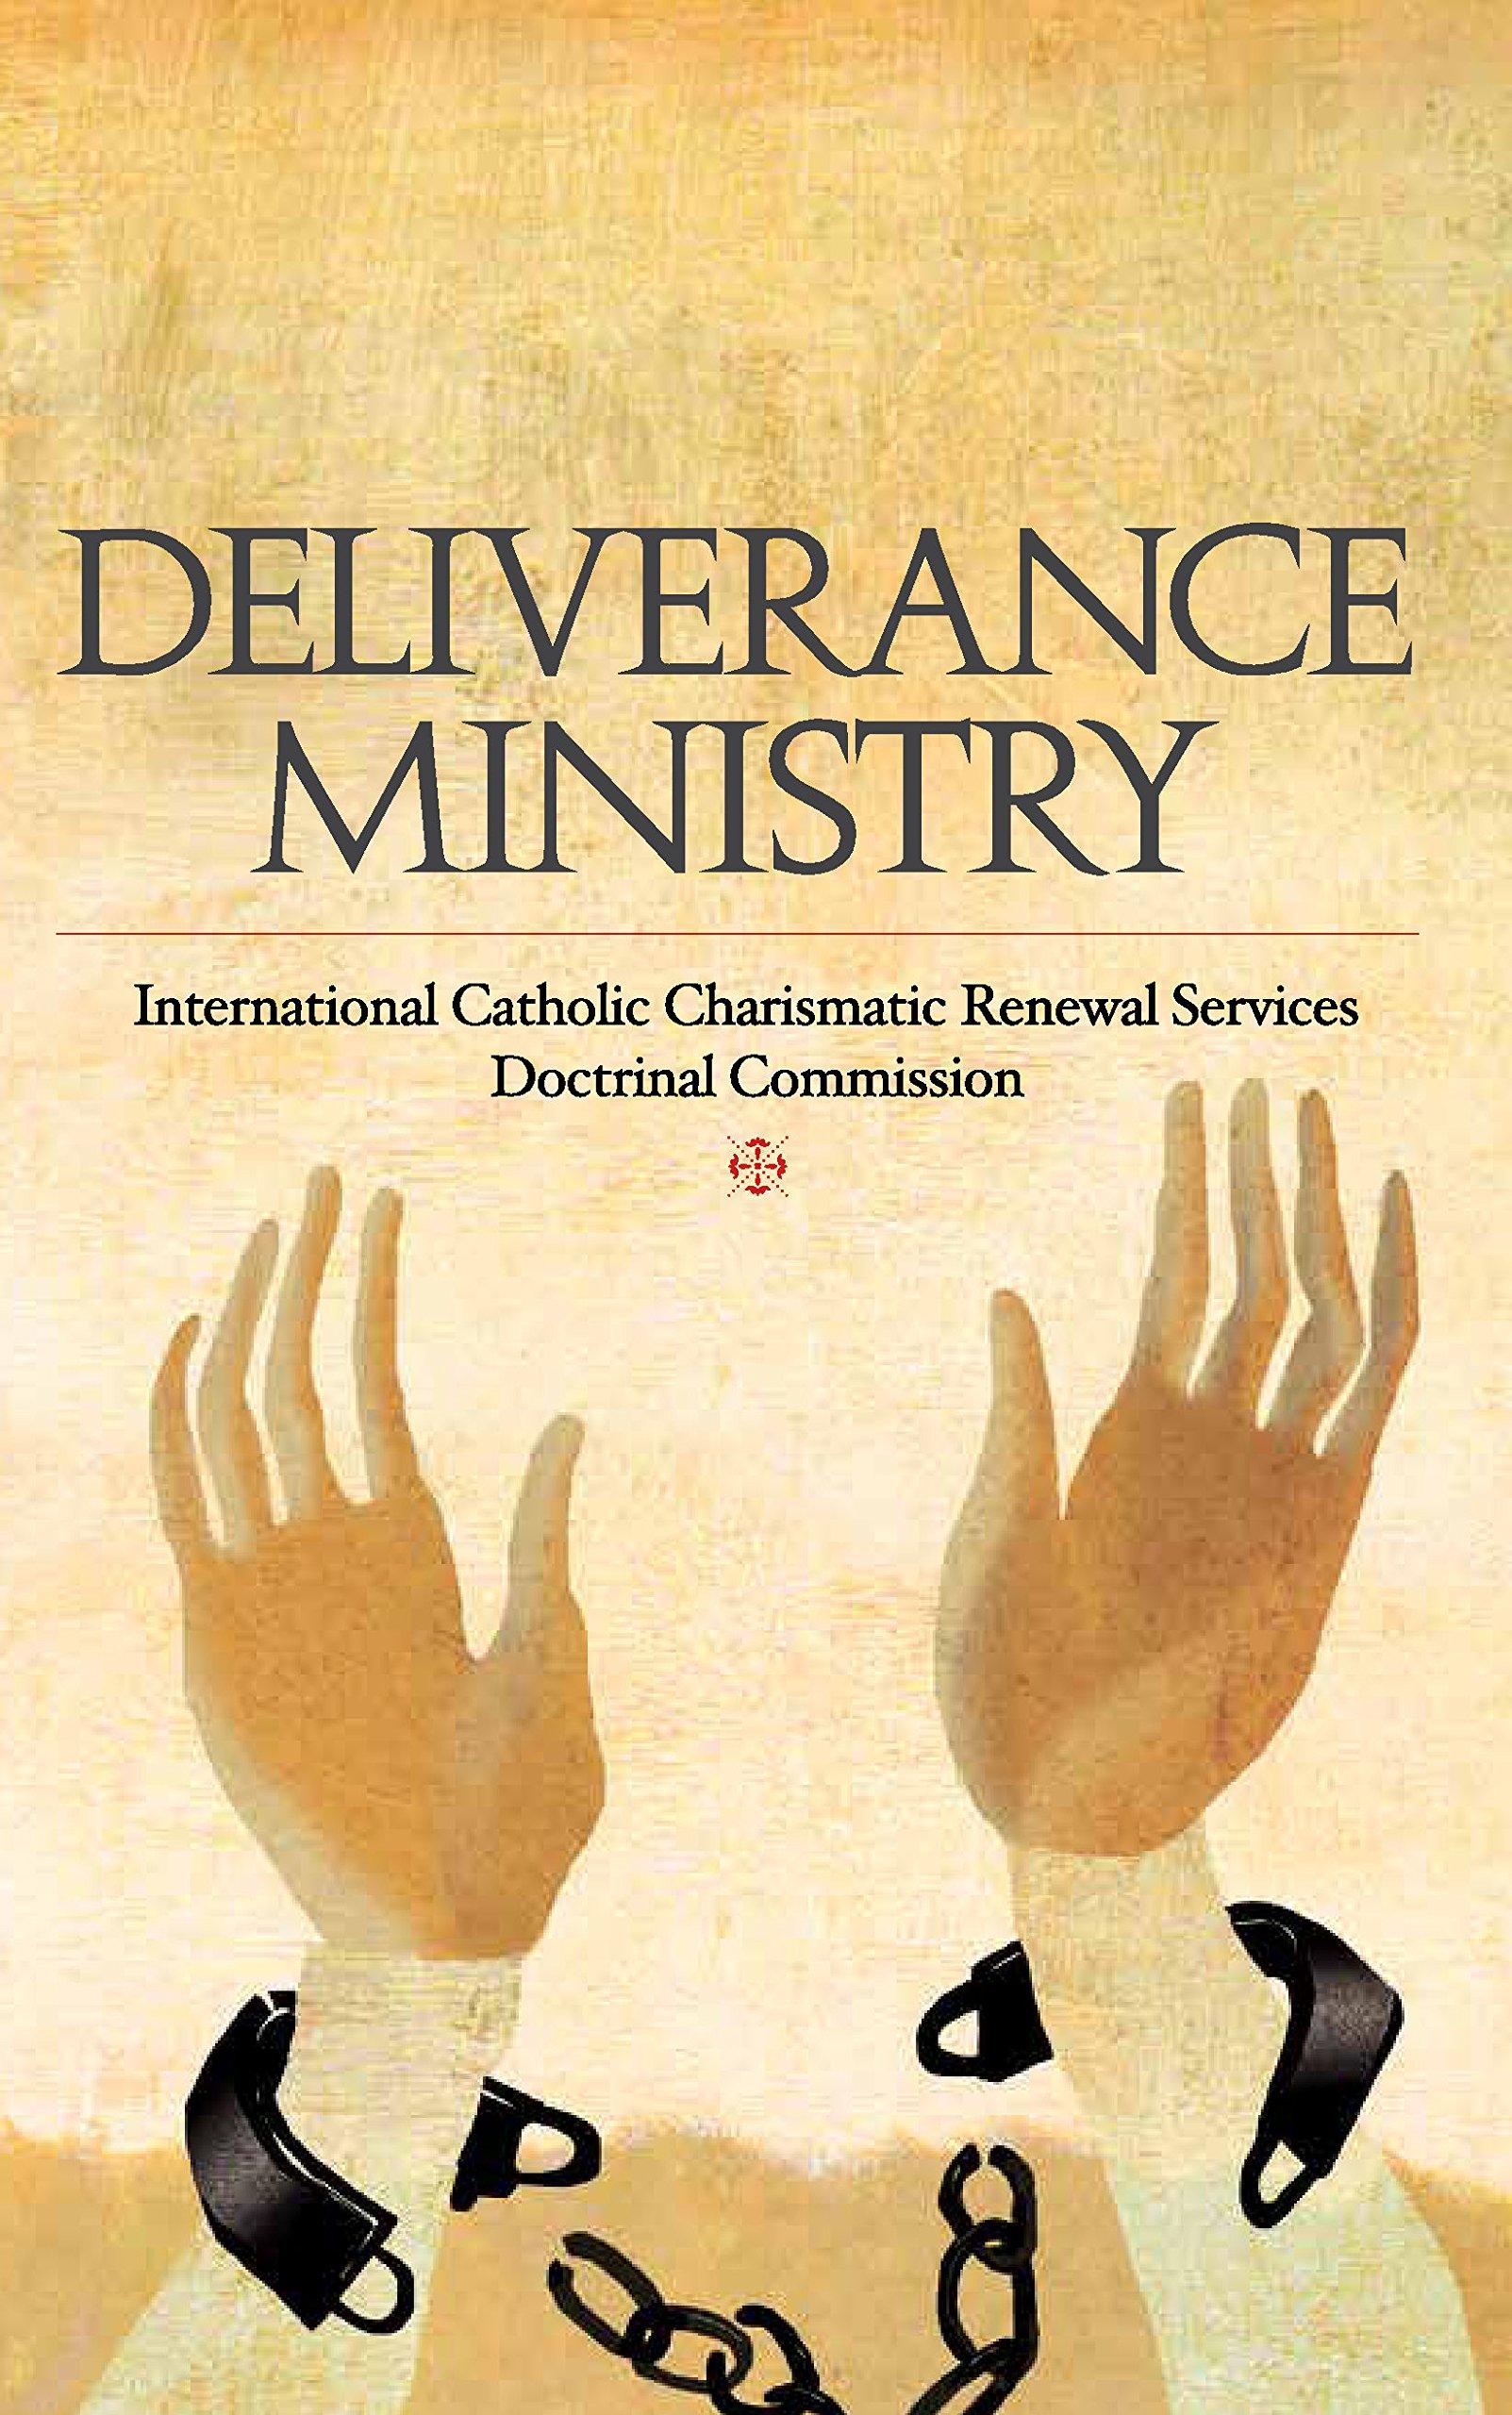 Deliverance Ministry: International Catholic Charismatic Renewal